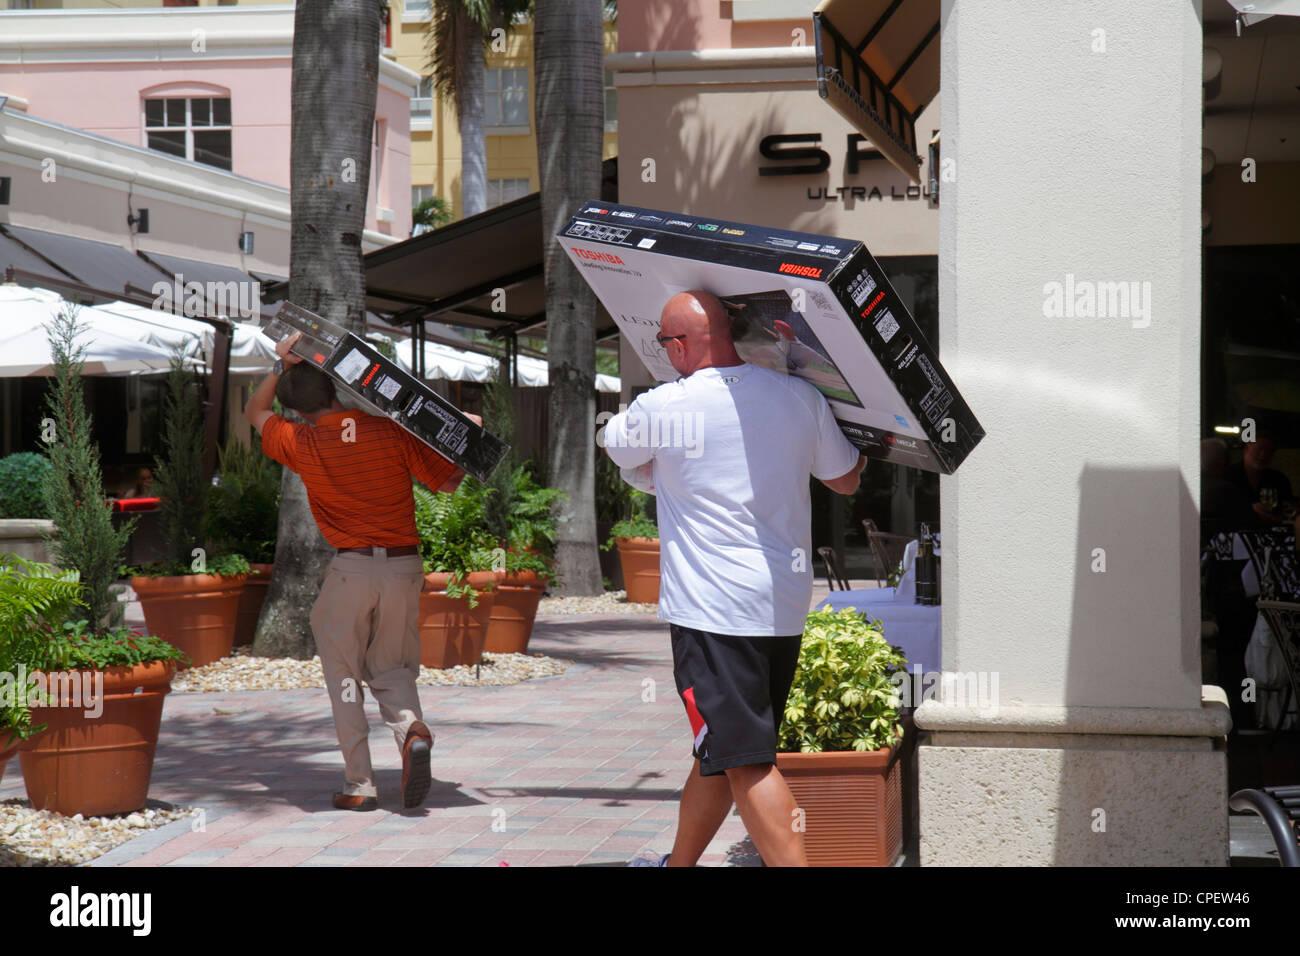 Boca Raton Florida Mizner Park Plaza Real upscale shopping business man carrying box Toshiba flat panel widescreen - Stock Image